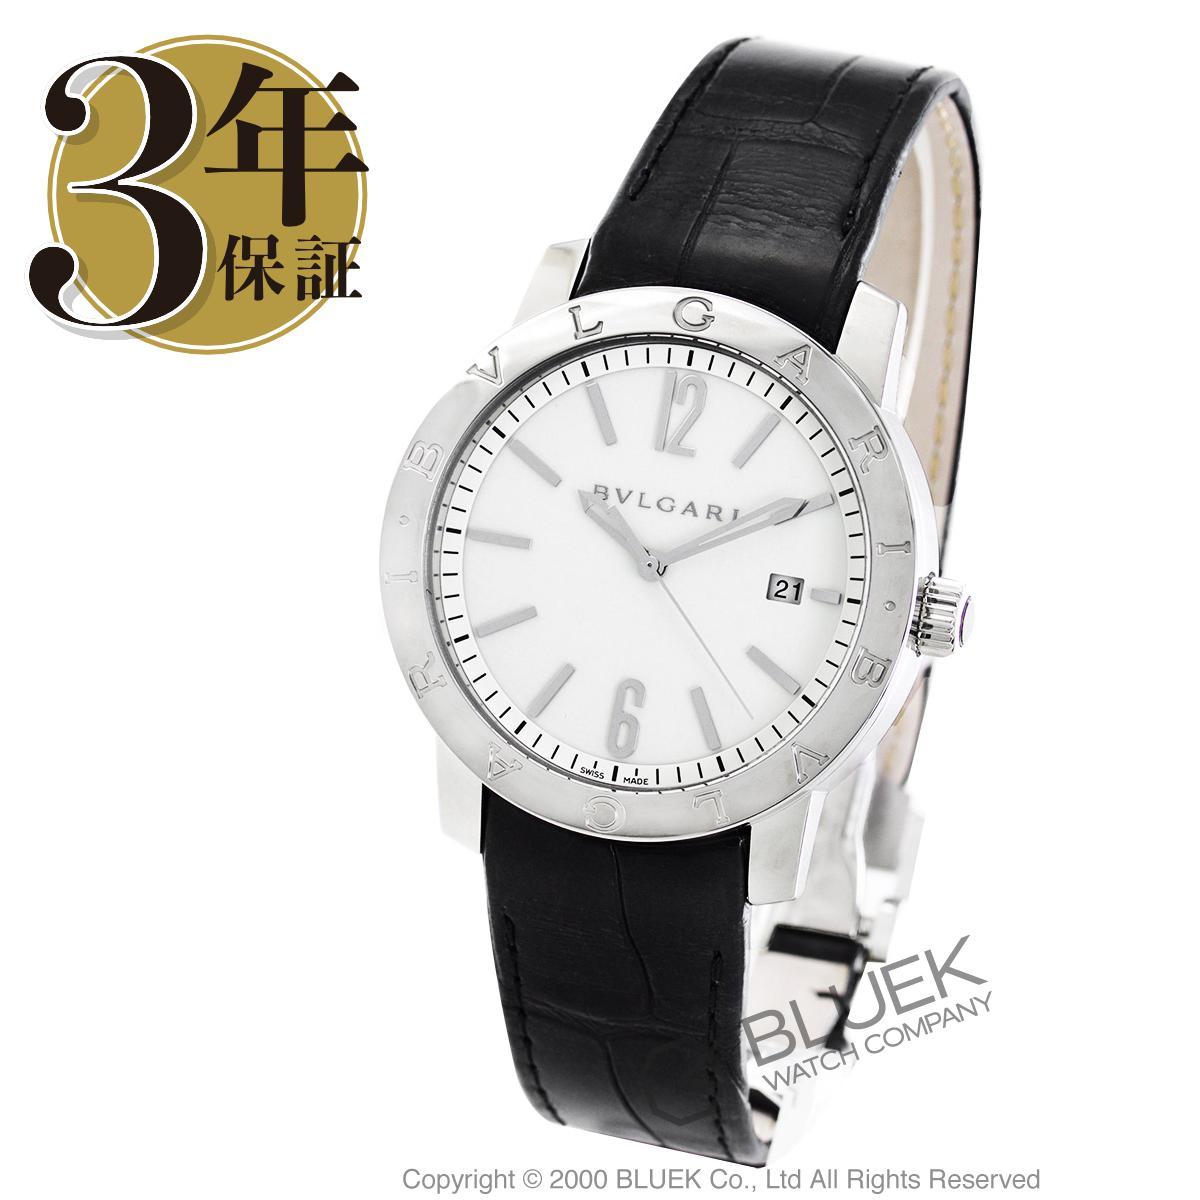 3eecc5b81d57 ブルガリ ブルガリブルガリ アリゲーターレザー 腕時計 メンズ BVLGARI BB41WSLD_8 [送料無料][対応][ブルガリ ][BB41WSLD][BVLGARI][時計][新品]